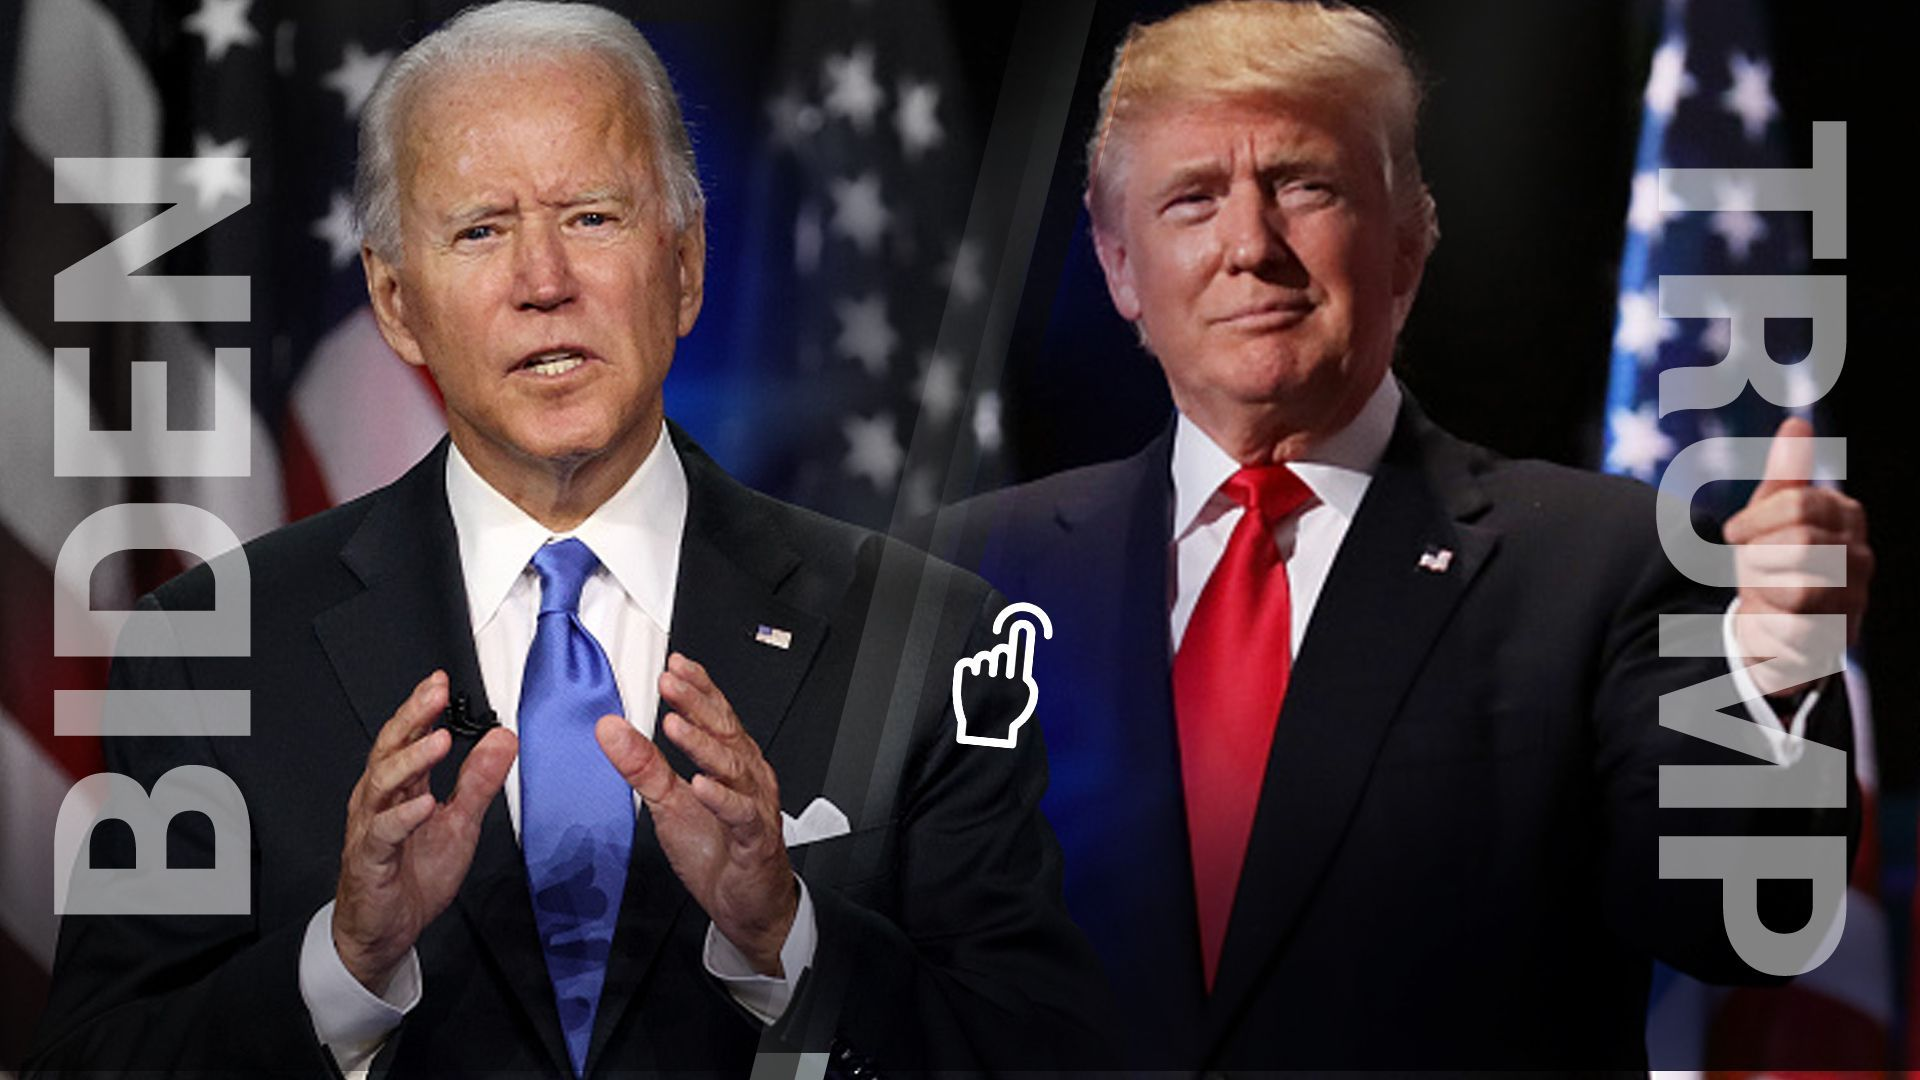 For whom the poll tolls: За кого бихте гласували, ако сте американец?